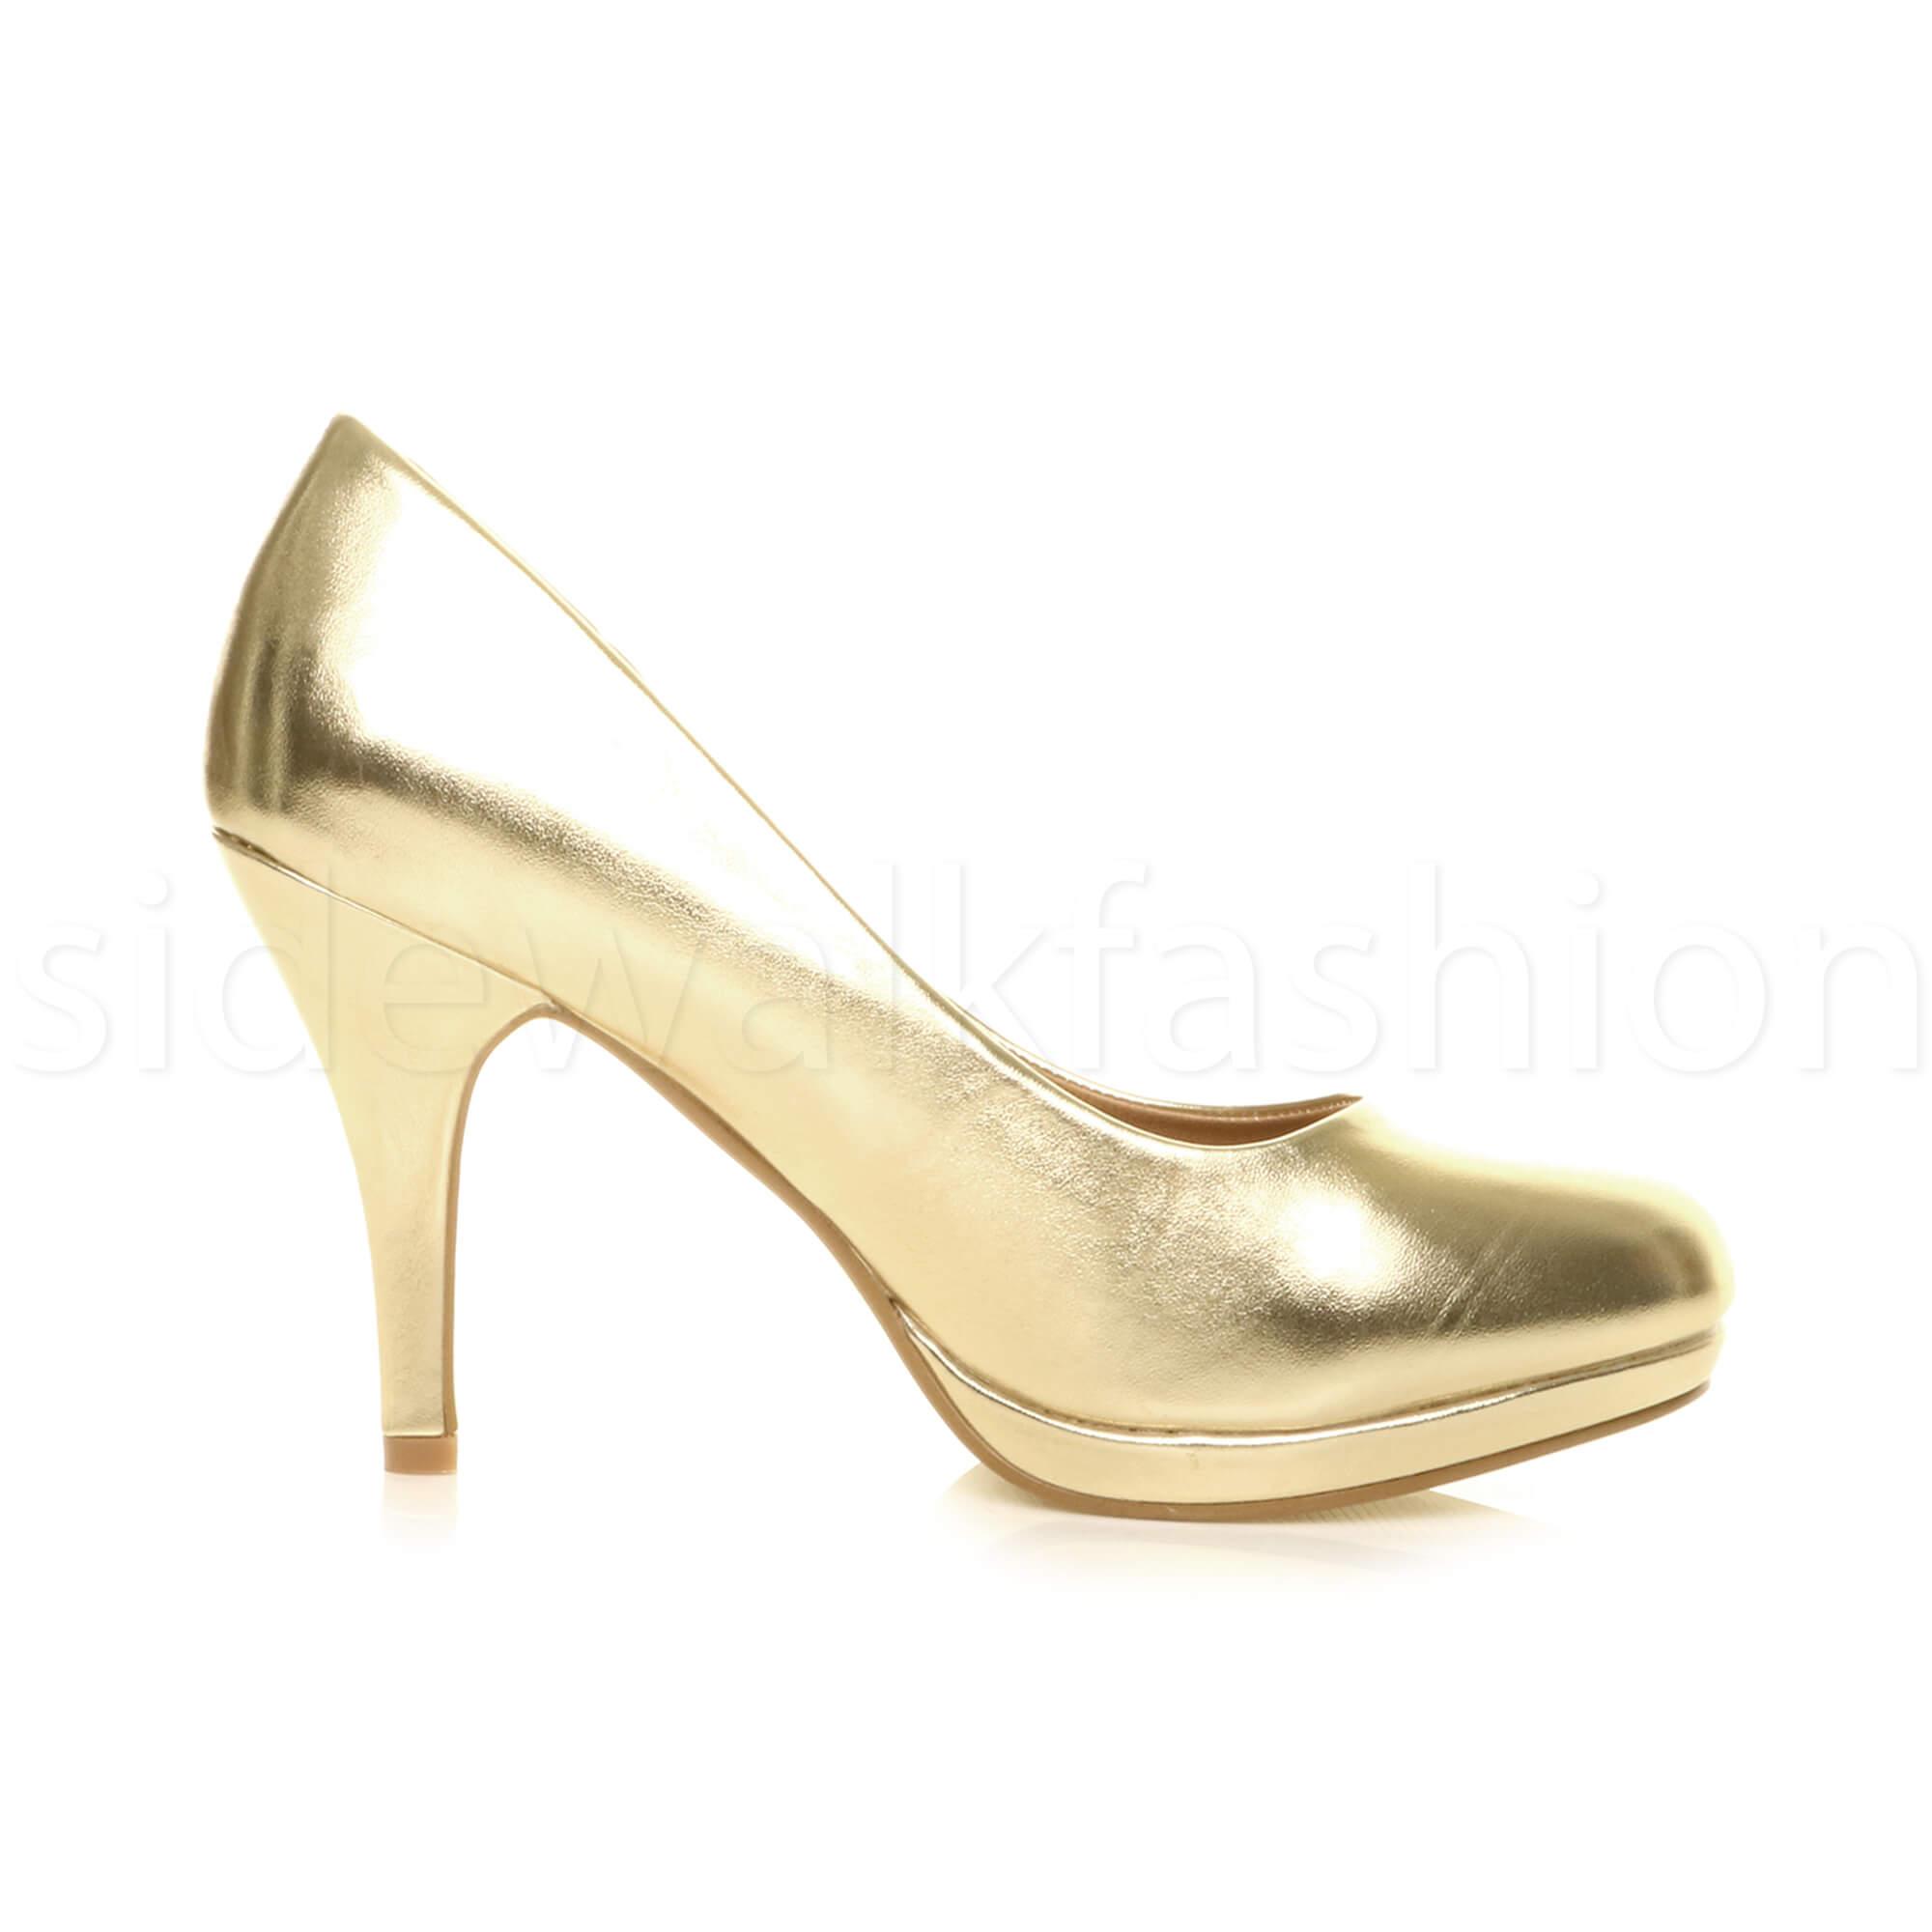 Womens-ladies-high-mid-heel-platform-wedding-evening-bridesmaid-court-shoes-size thumbnail 60